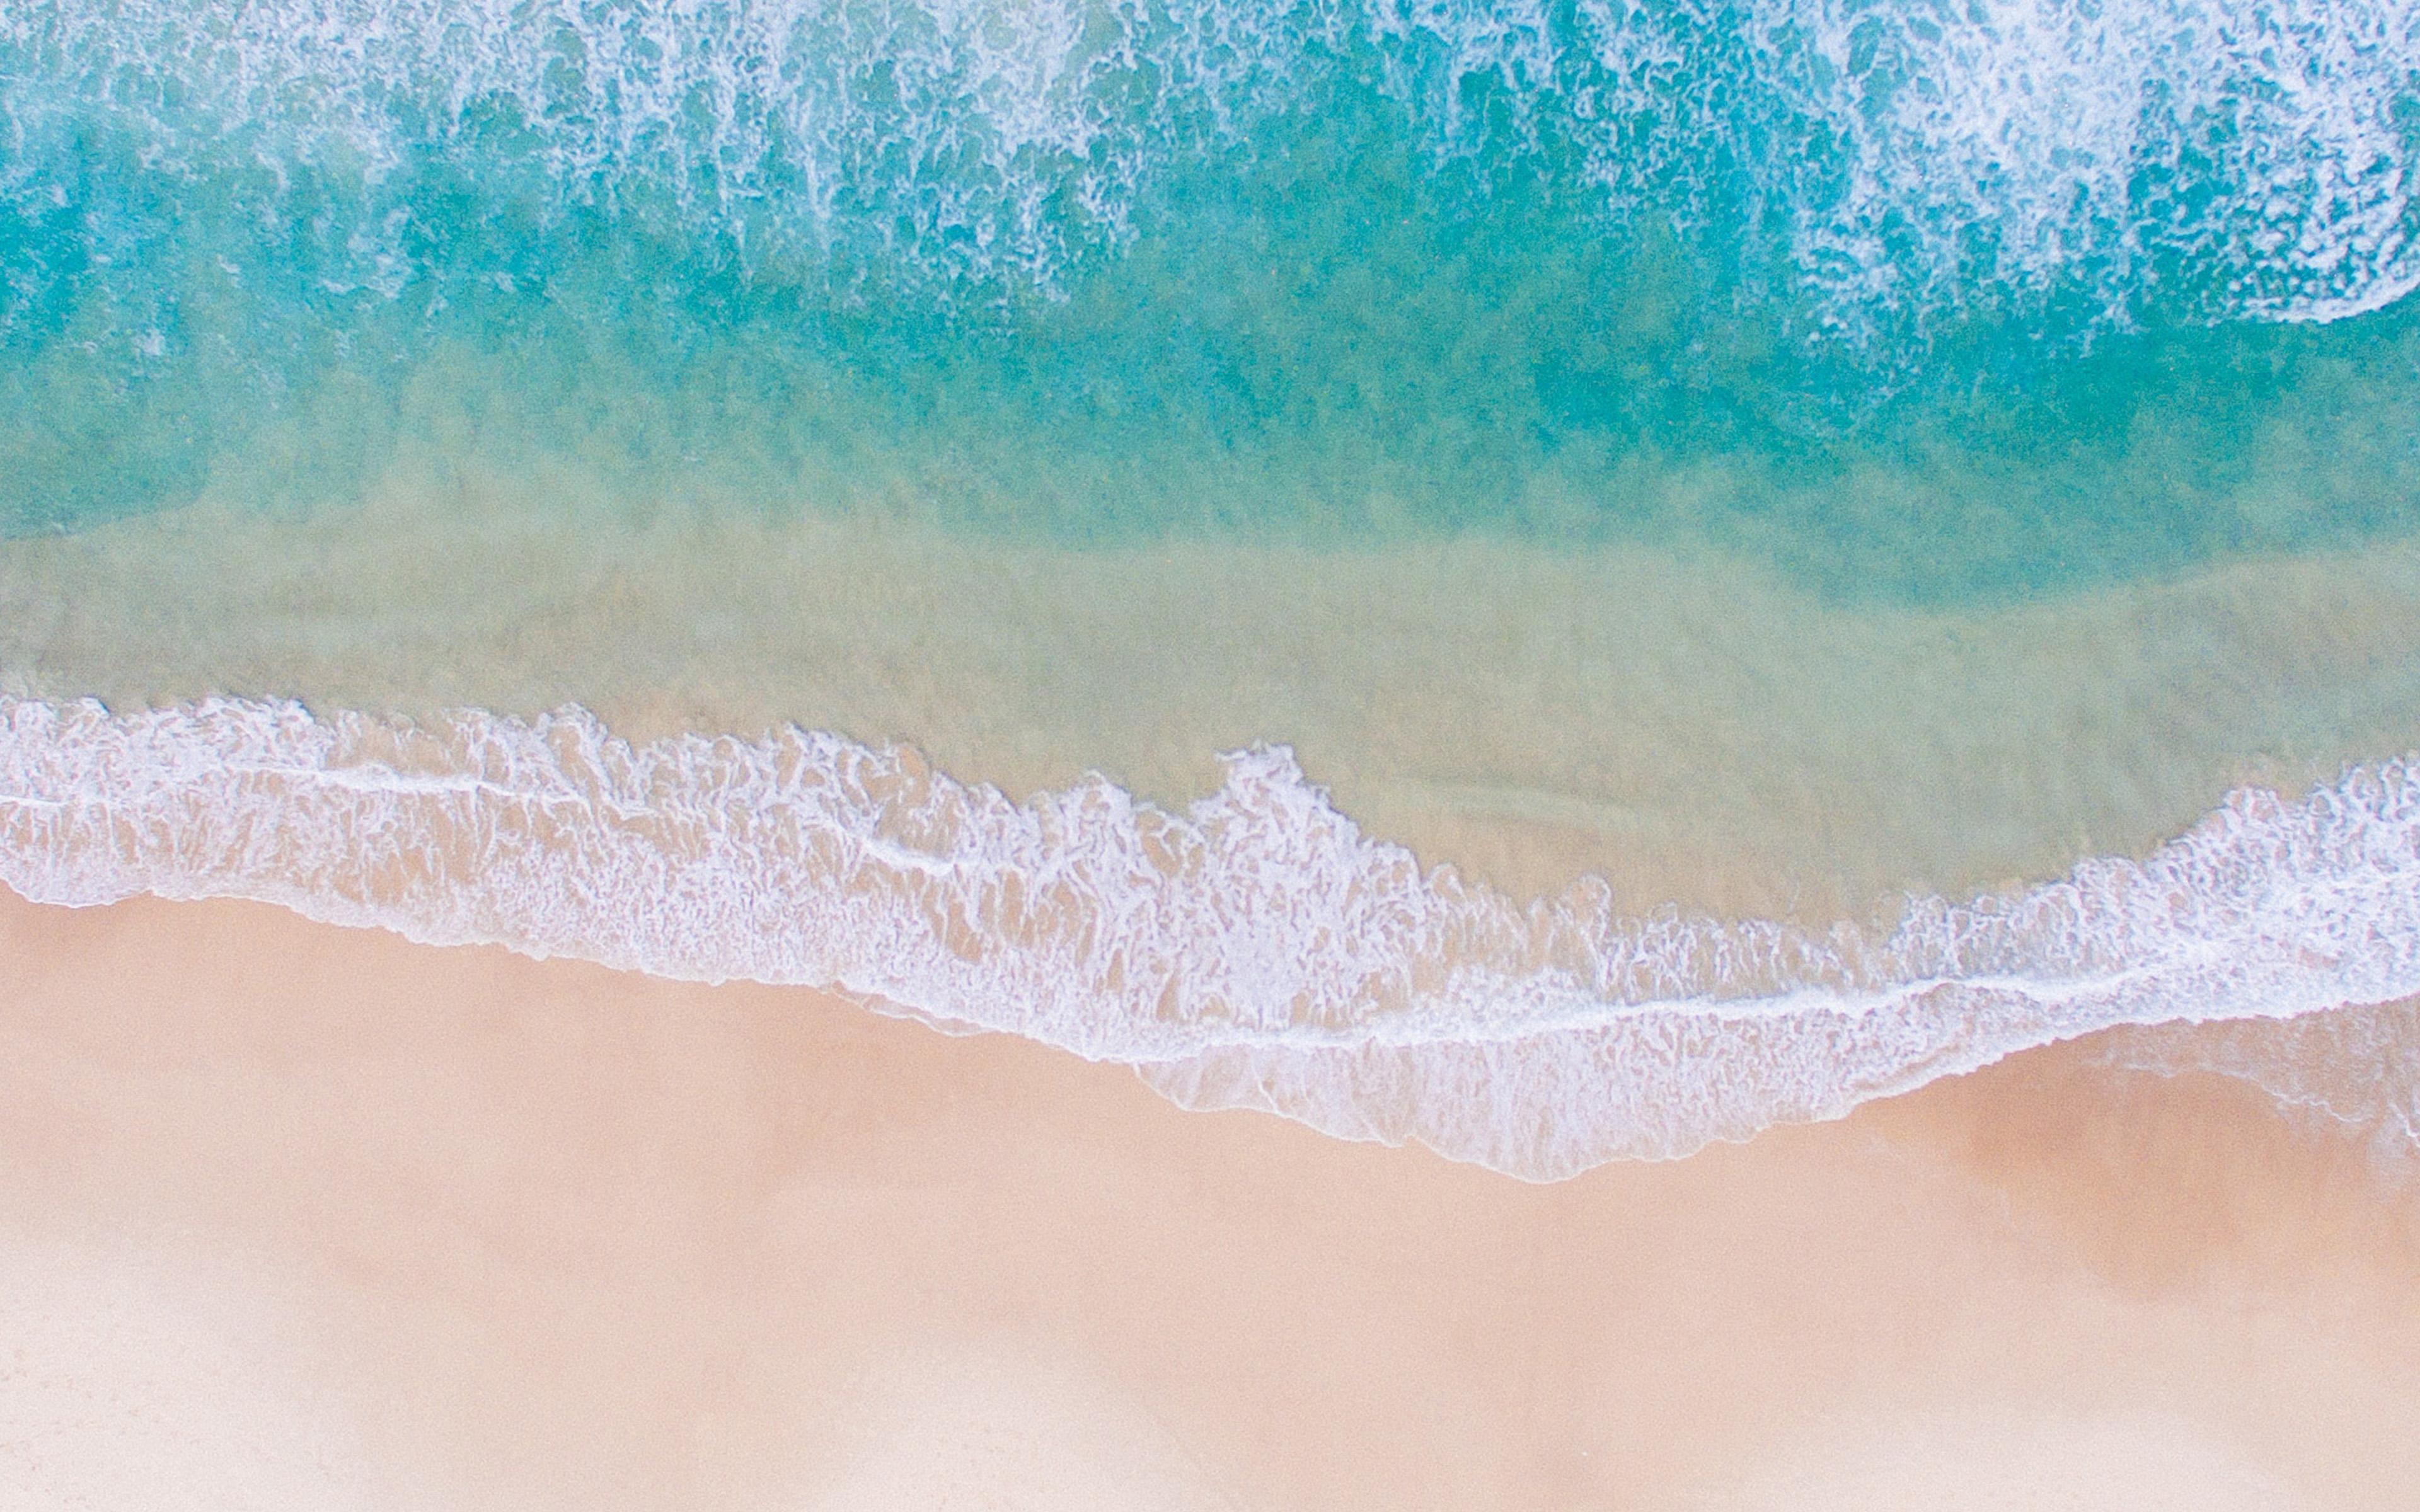 nv20-sea-beach-water-summer-nature-earth-wallpaper